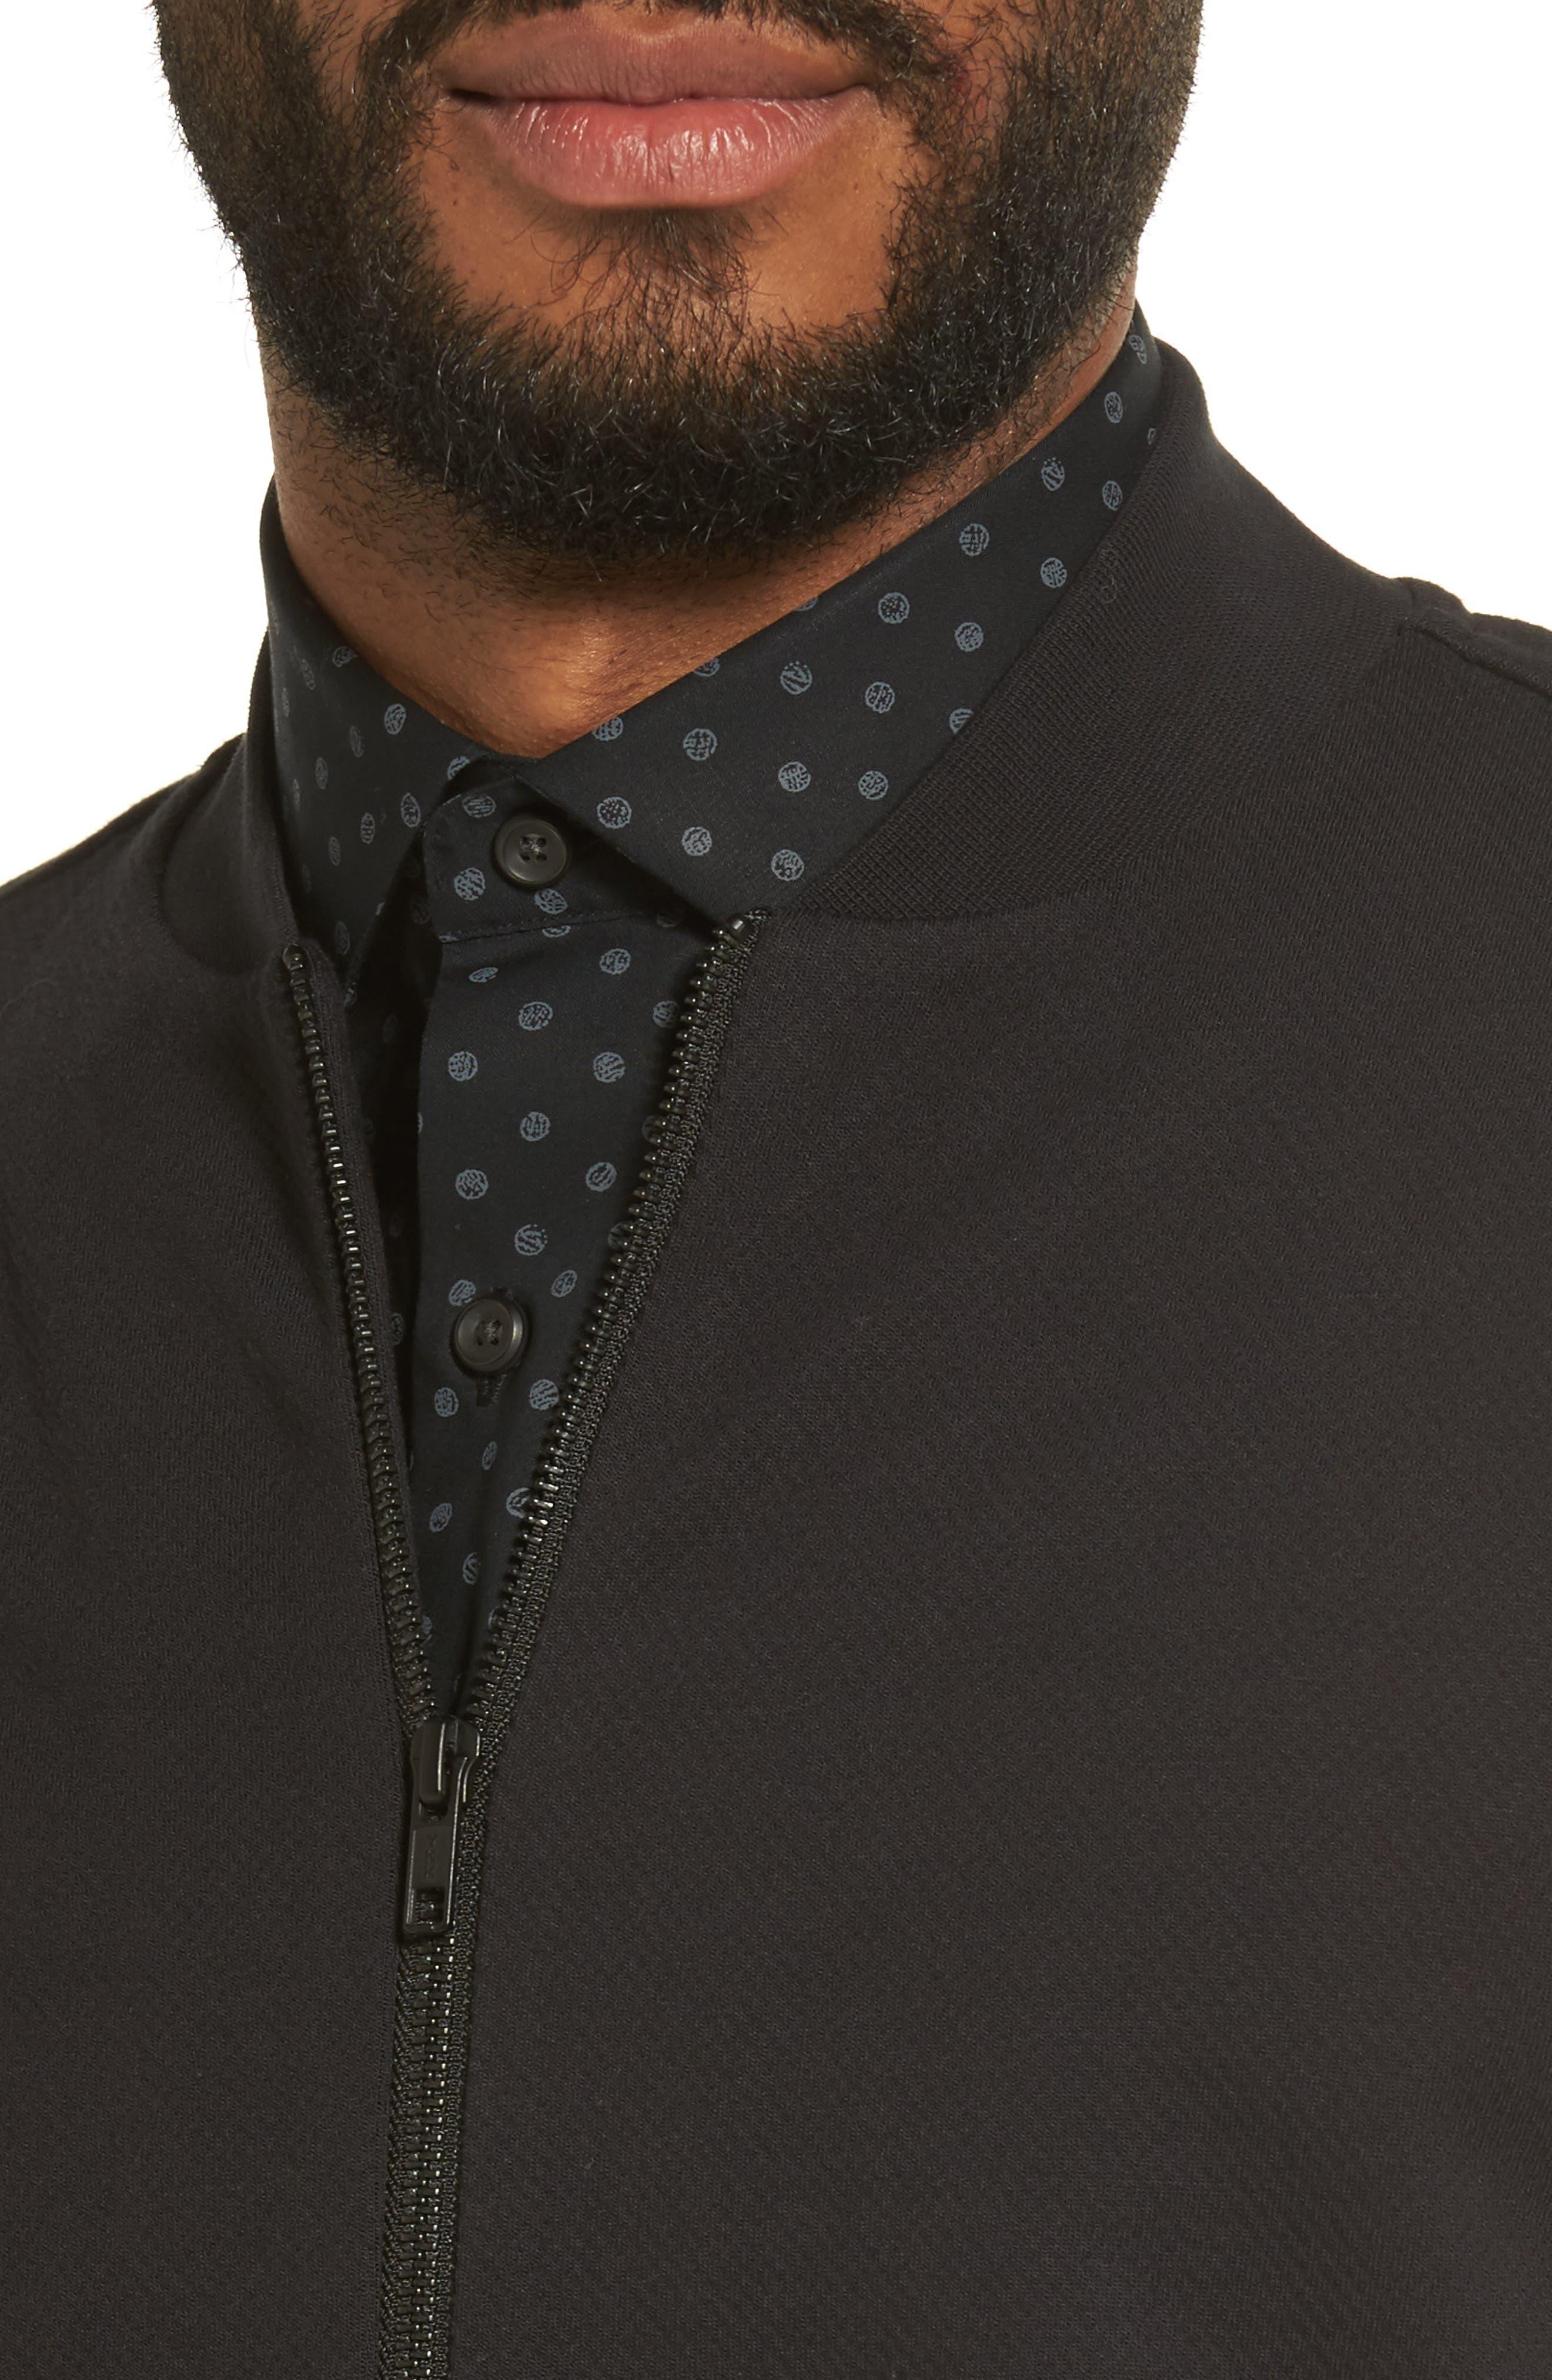 Zip Fleece Bomber Jacket,                             Alternate thumbnail 4, color,                             001